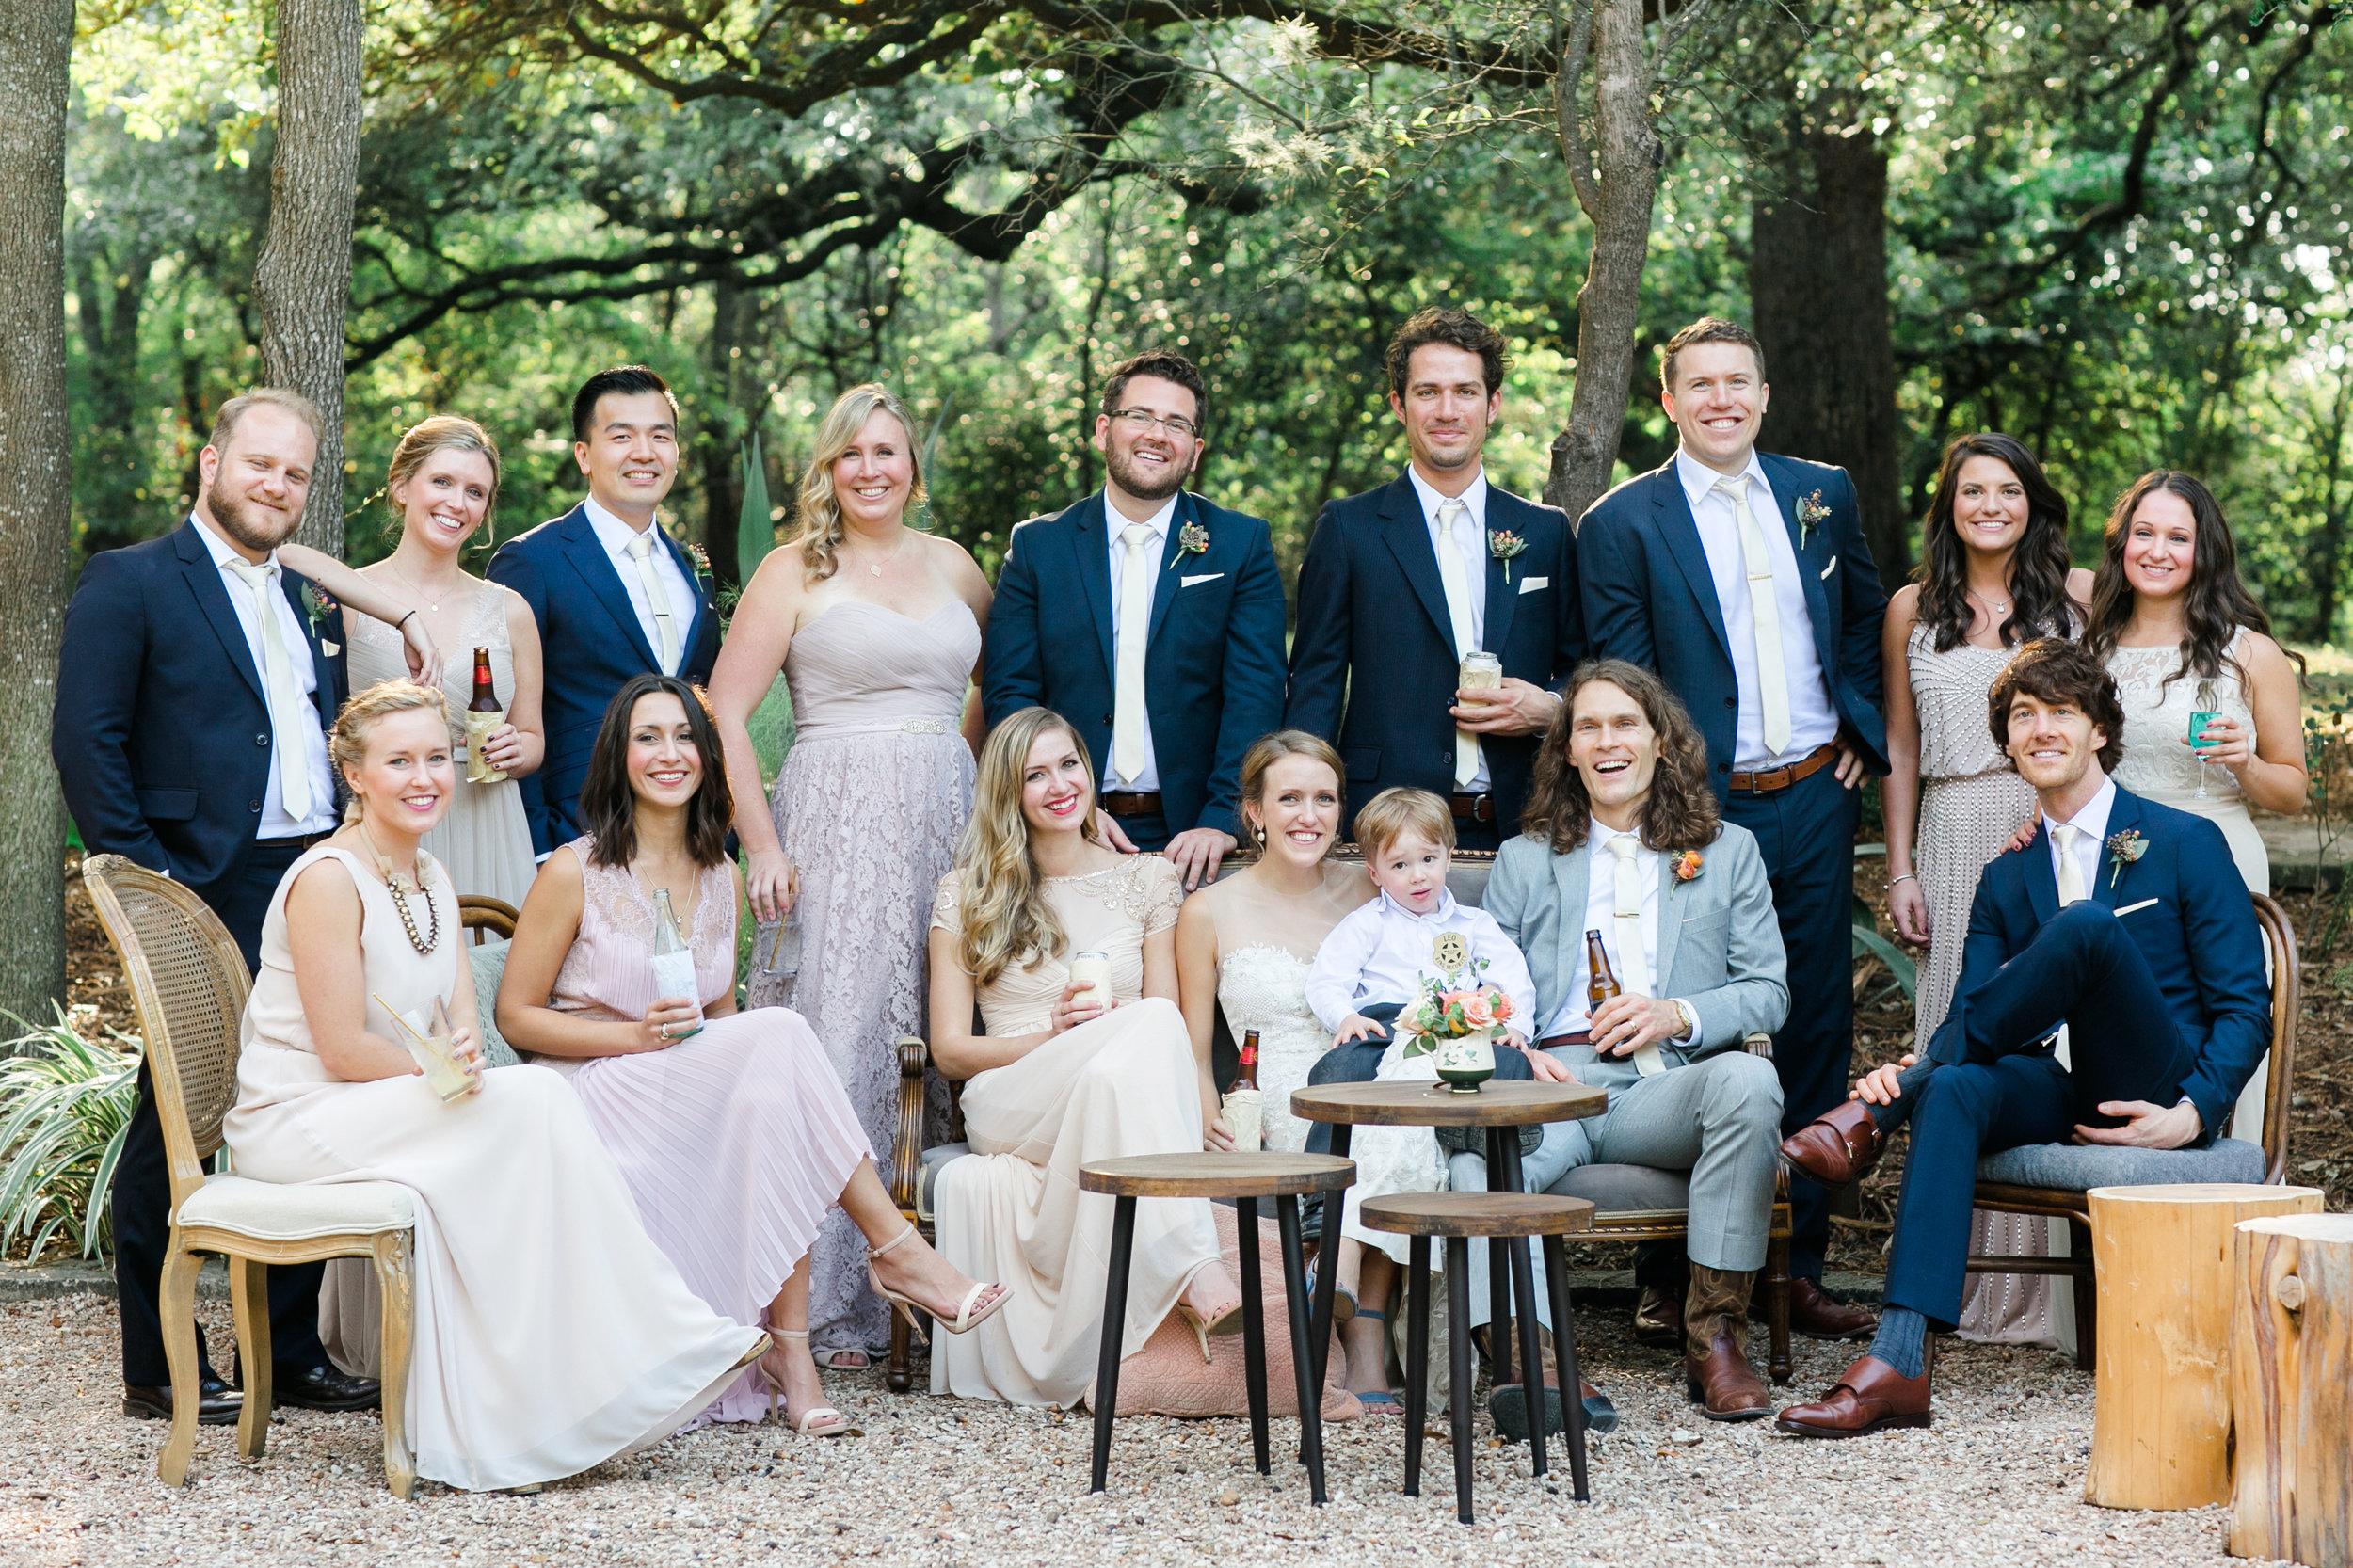 Austin Texas Fine Art Photographer Kayla Snell Photography - Mercury Hall Brunch Wedding